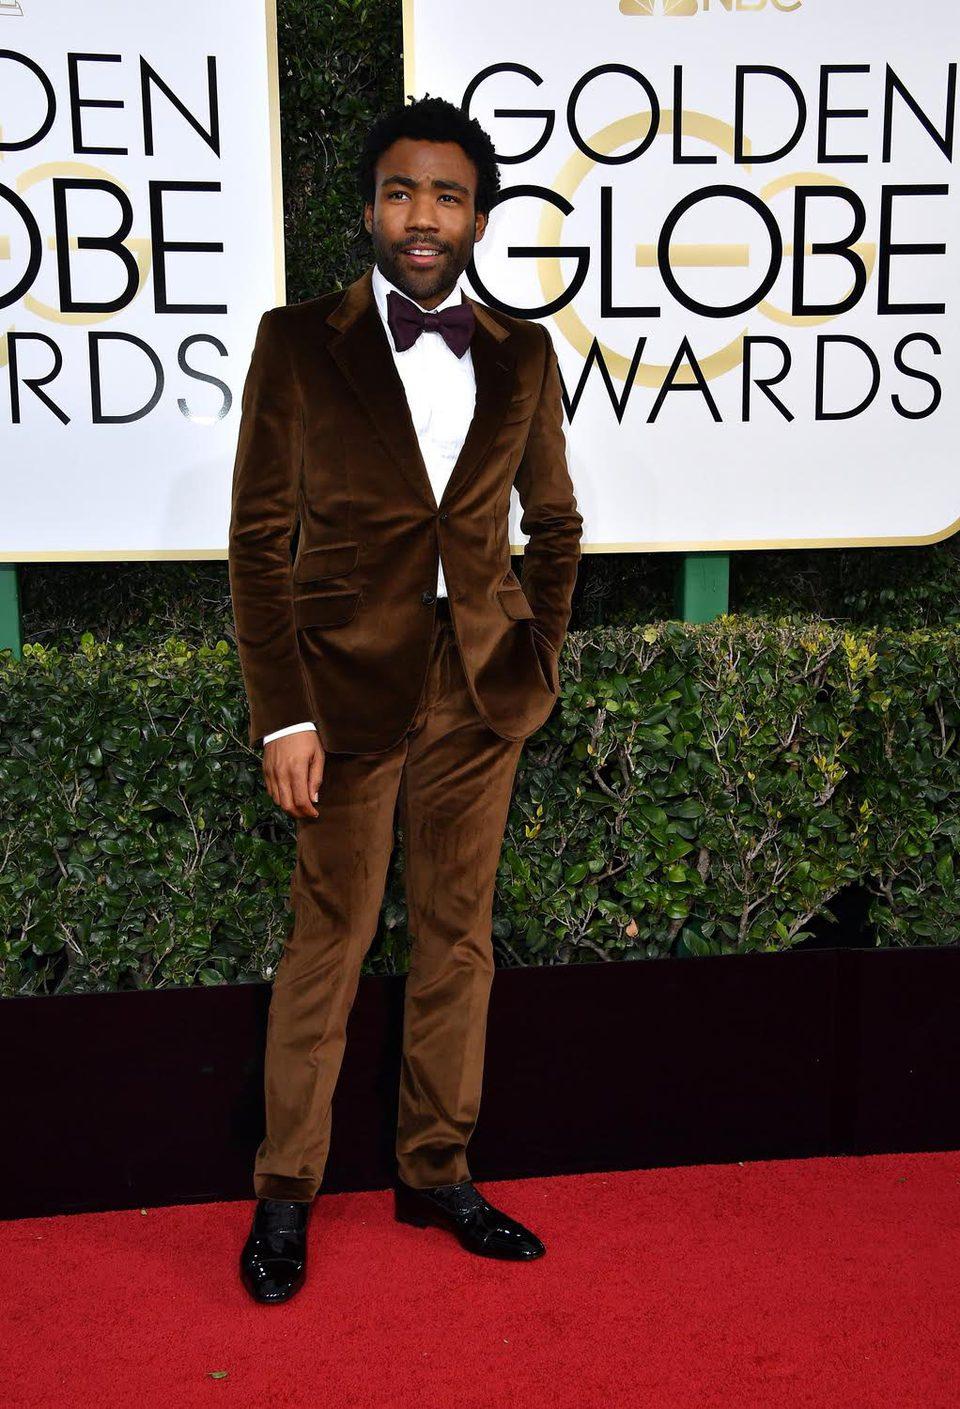 Donald Glover at Golden Globes 2017 red carpet